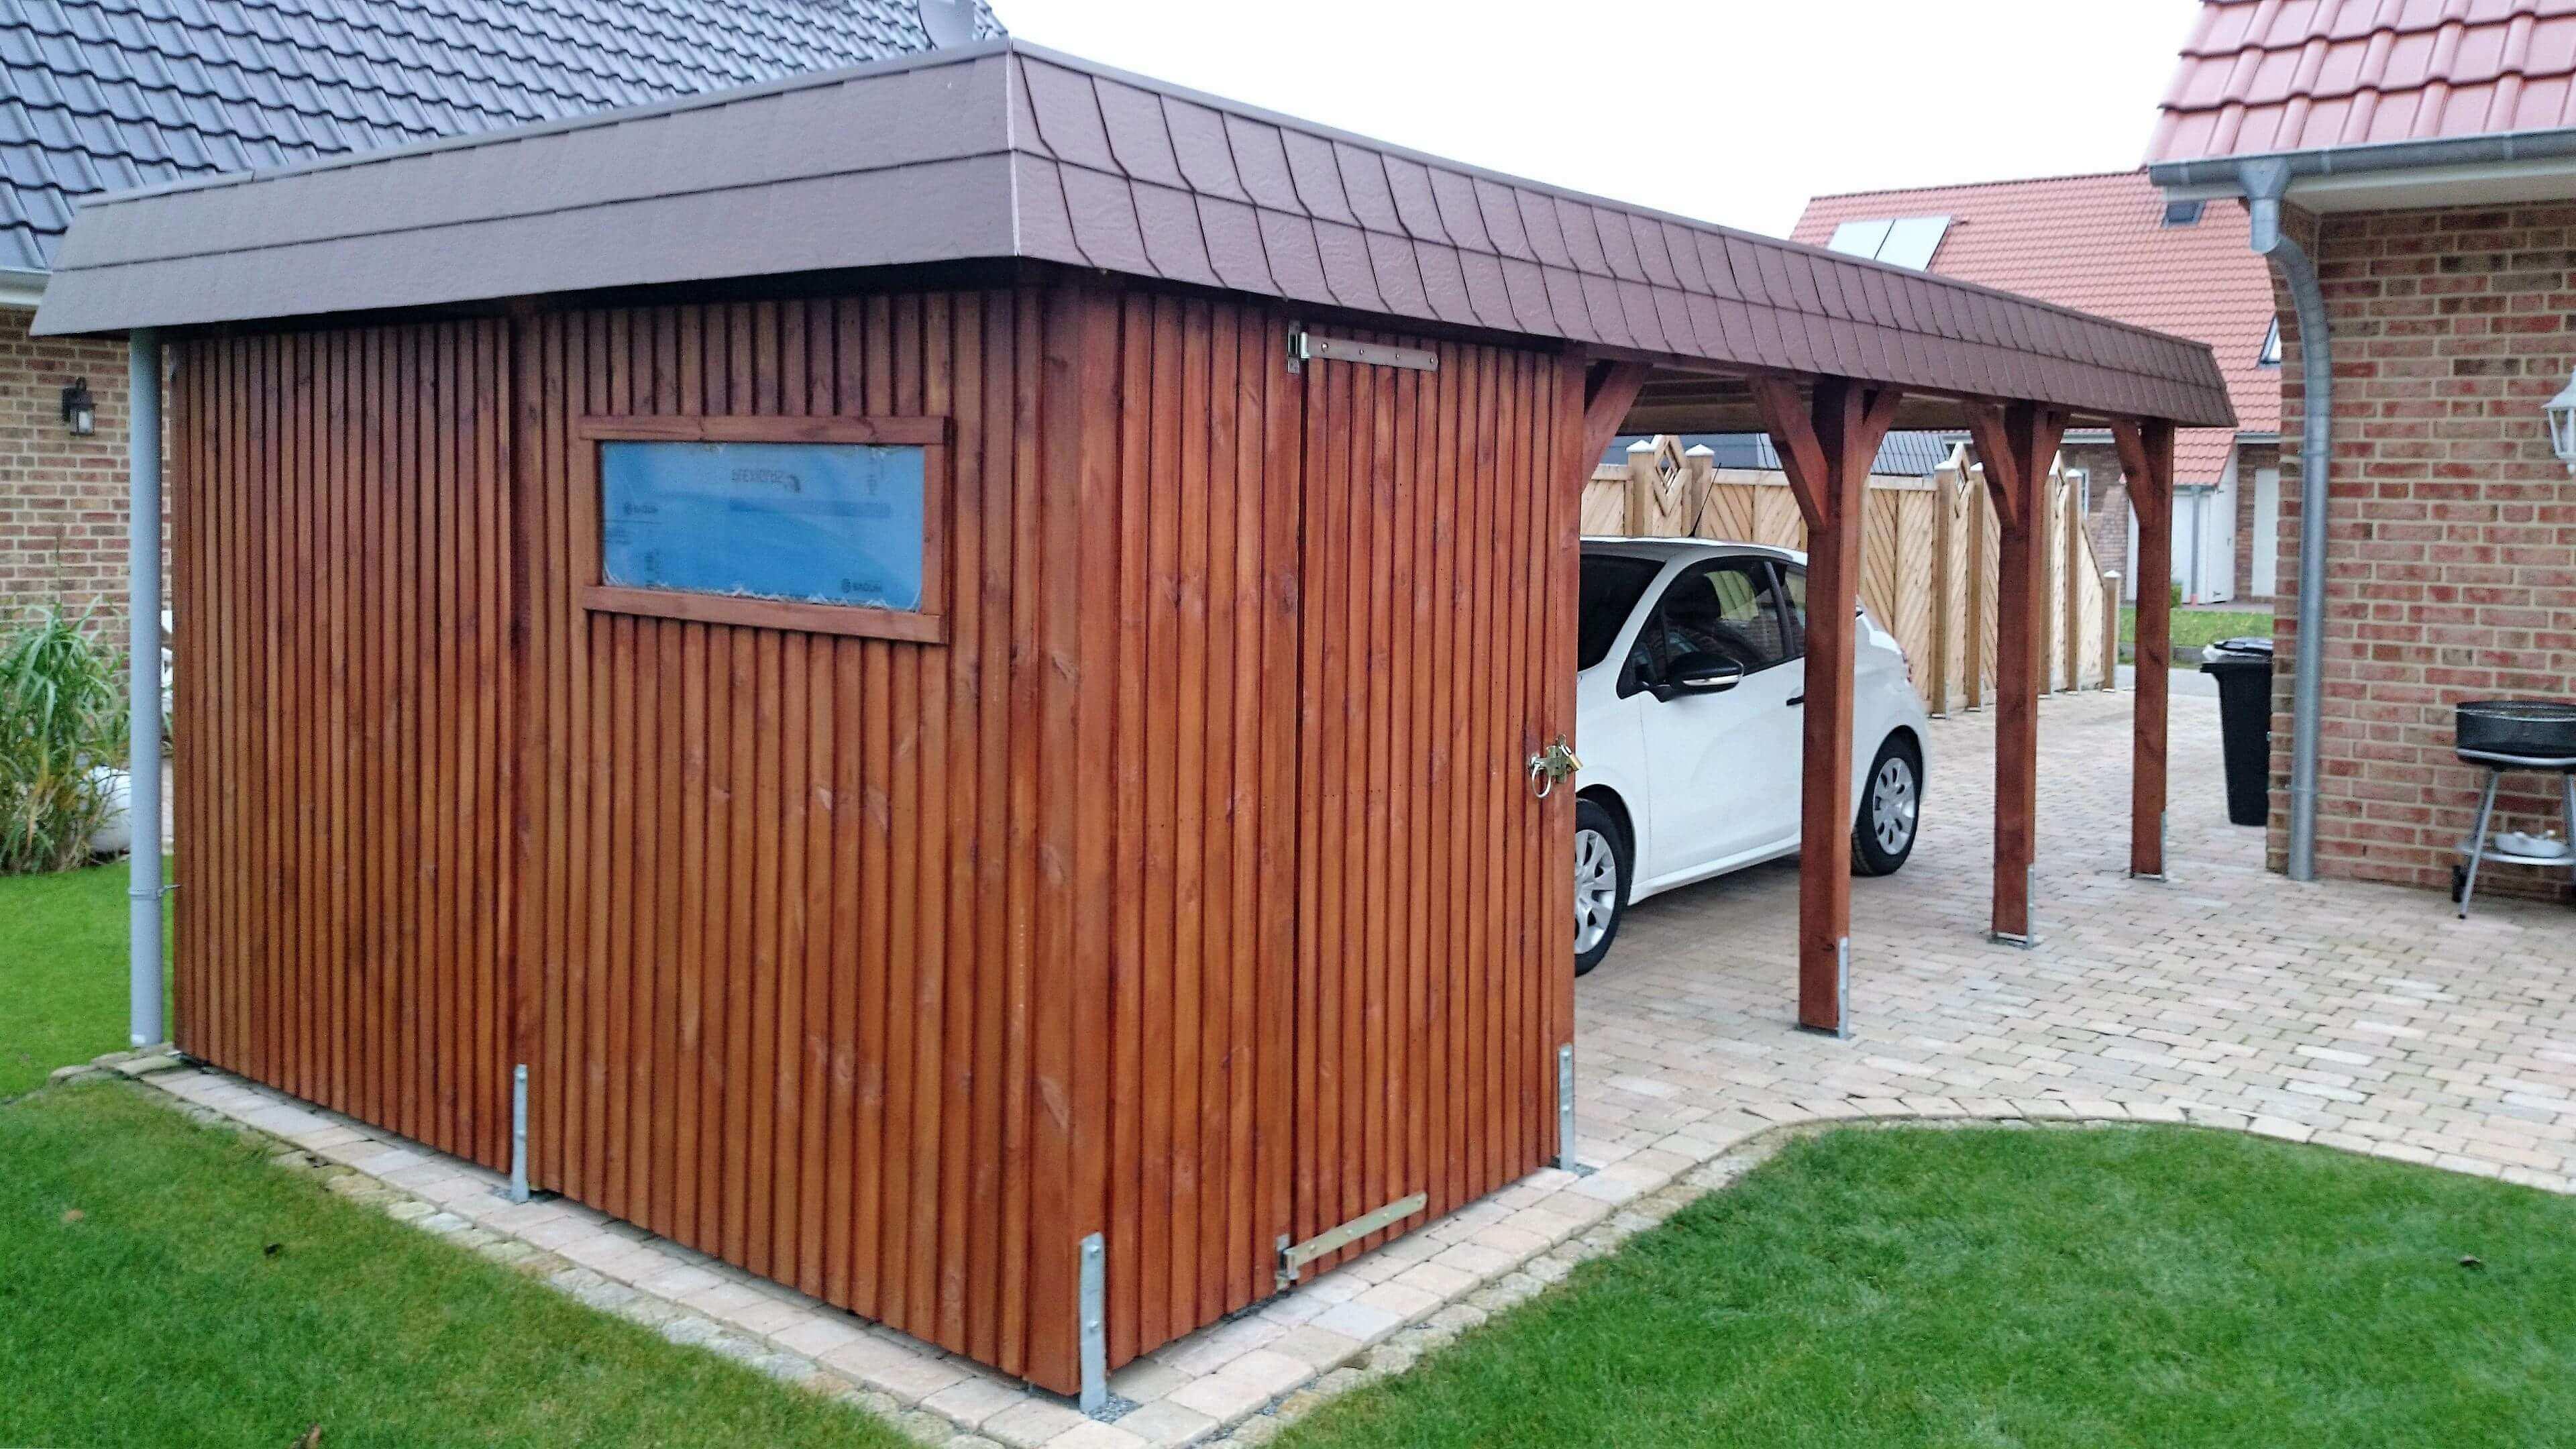 flachdach carport aus holz mit carport konfigurator planen gro e carport bilder galerie. Black Bedroom Furniture Sets. Home Design Ideas